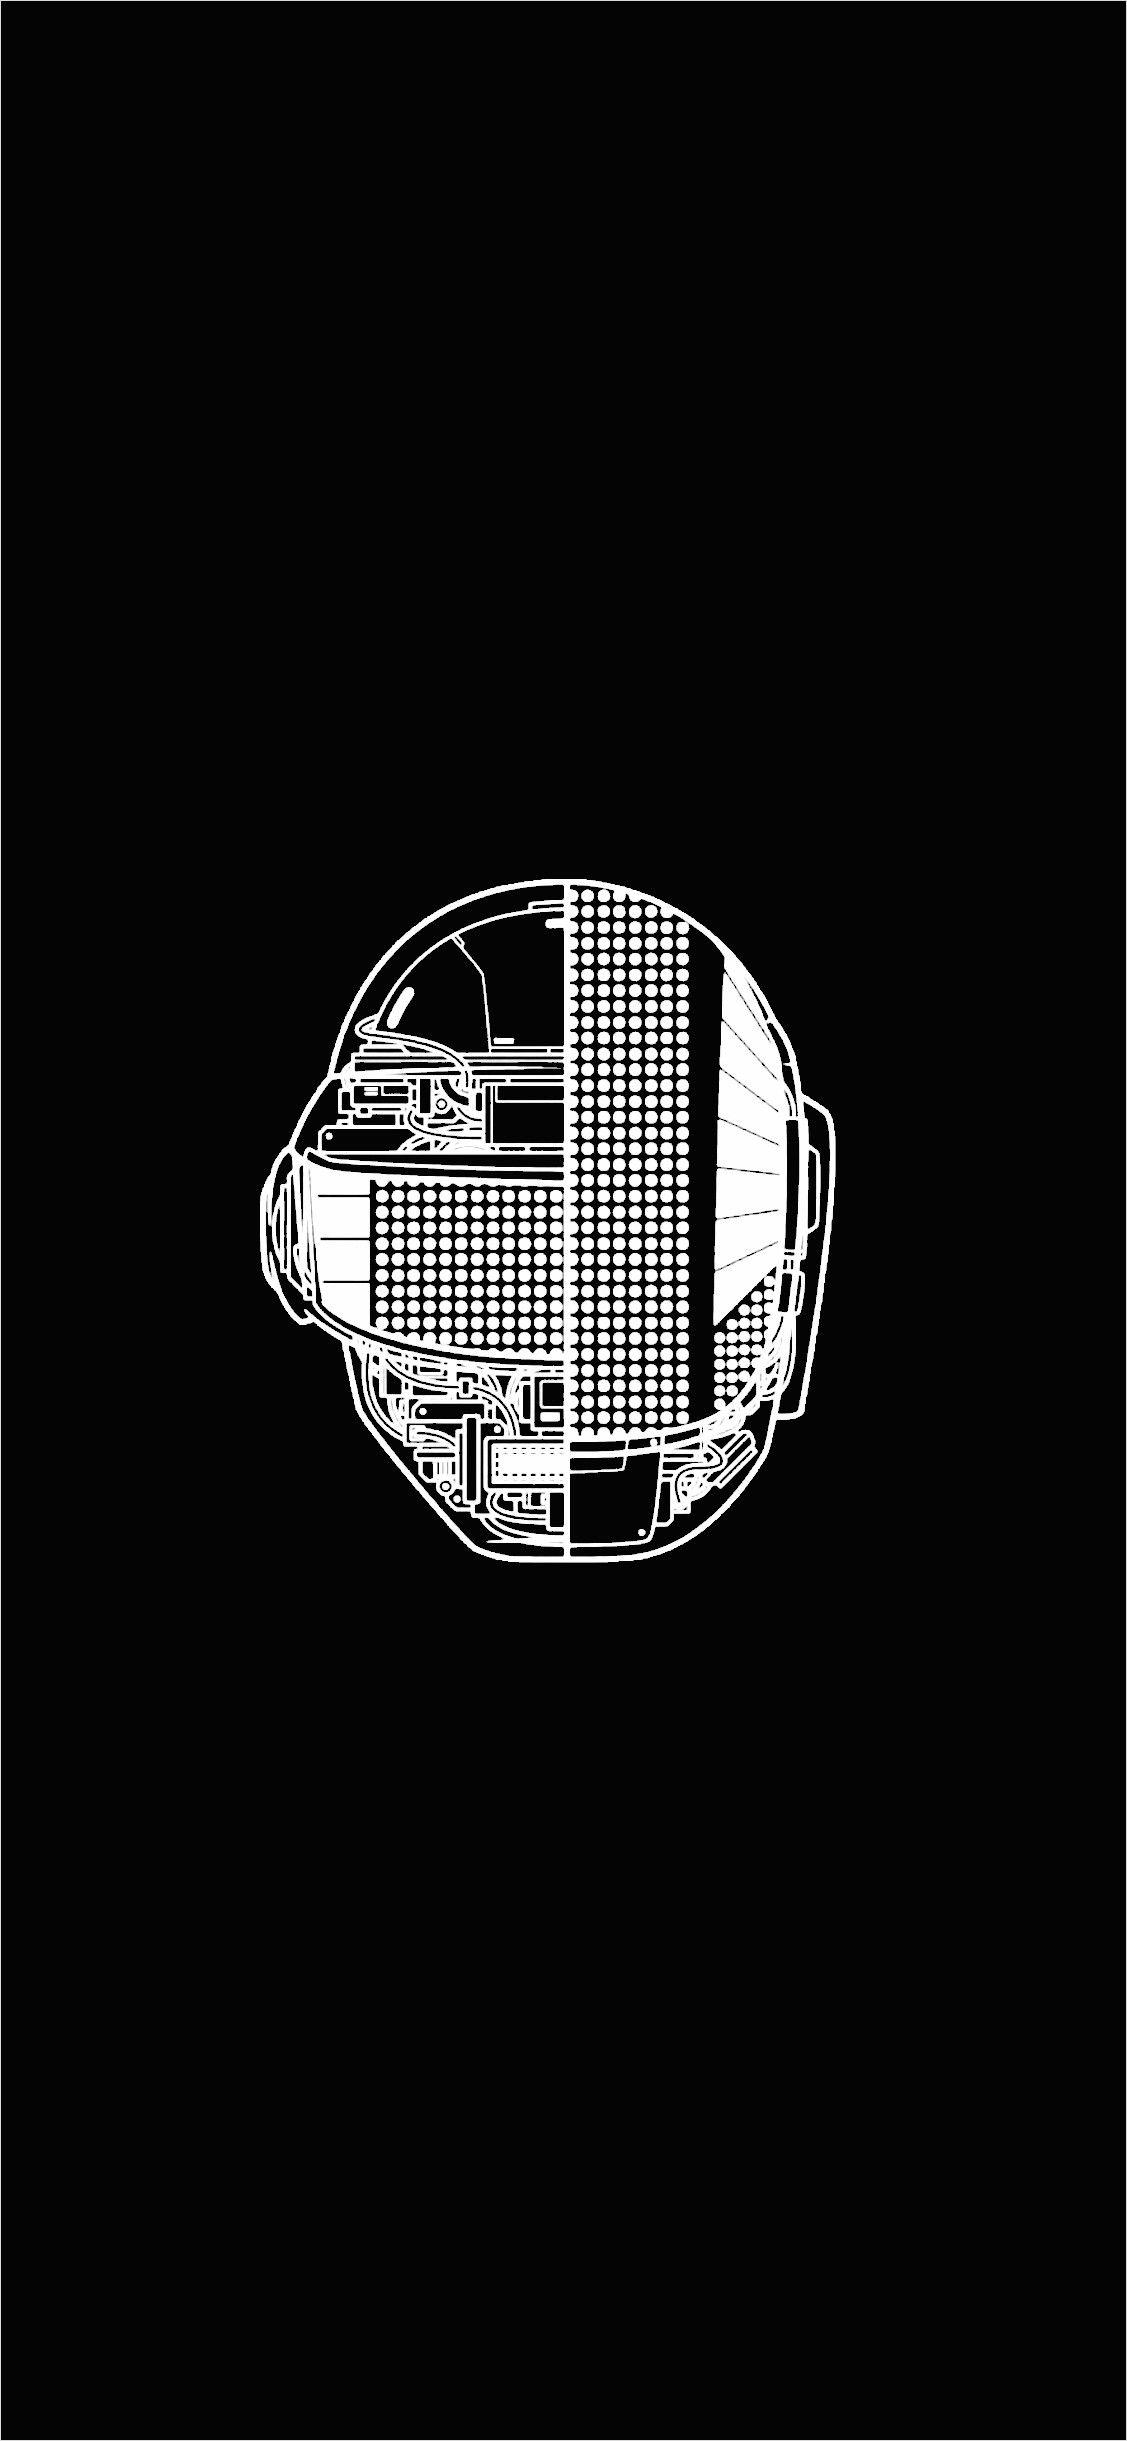 Ultra Hd Daft Punk Iphone Wallpaper - Wallpaper Download